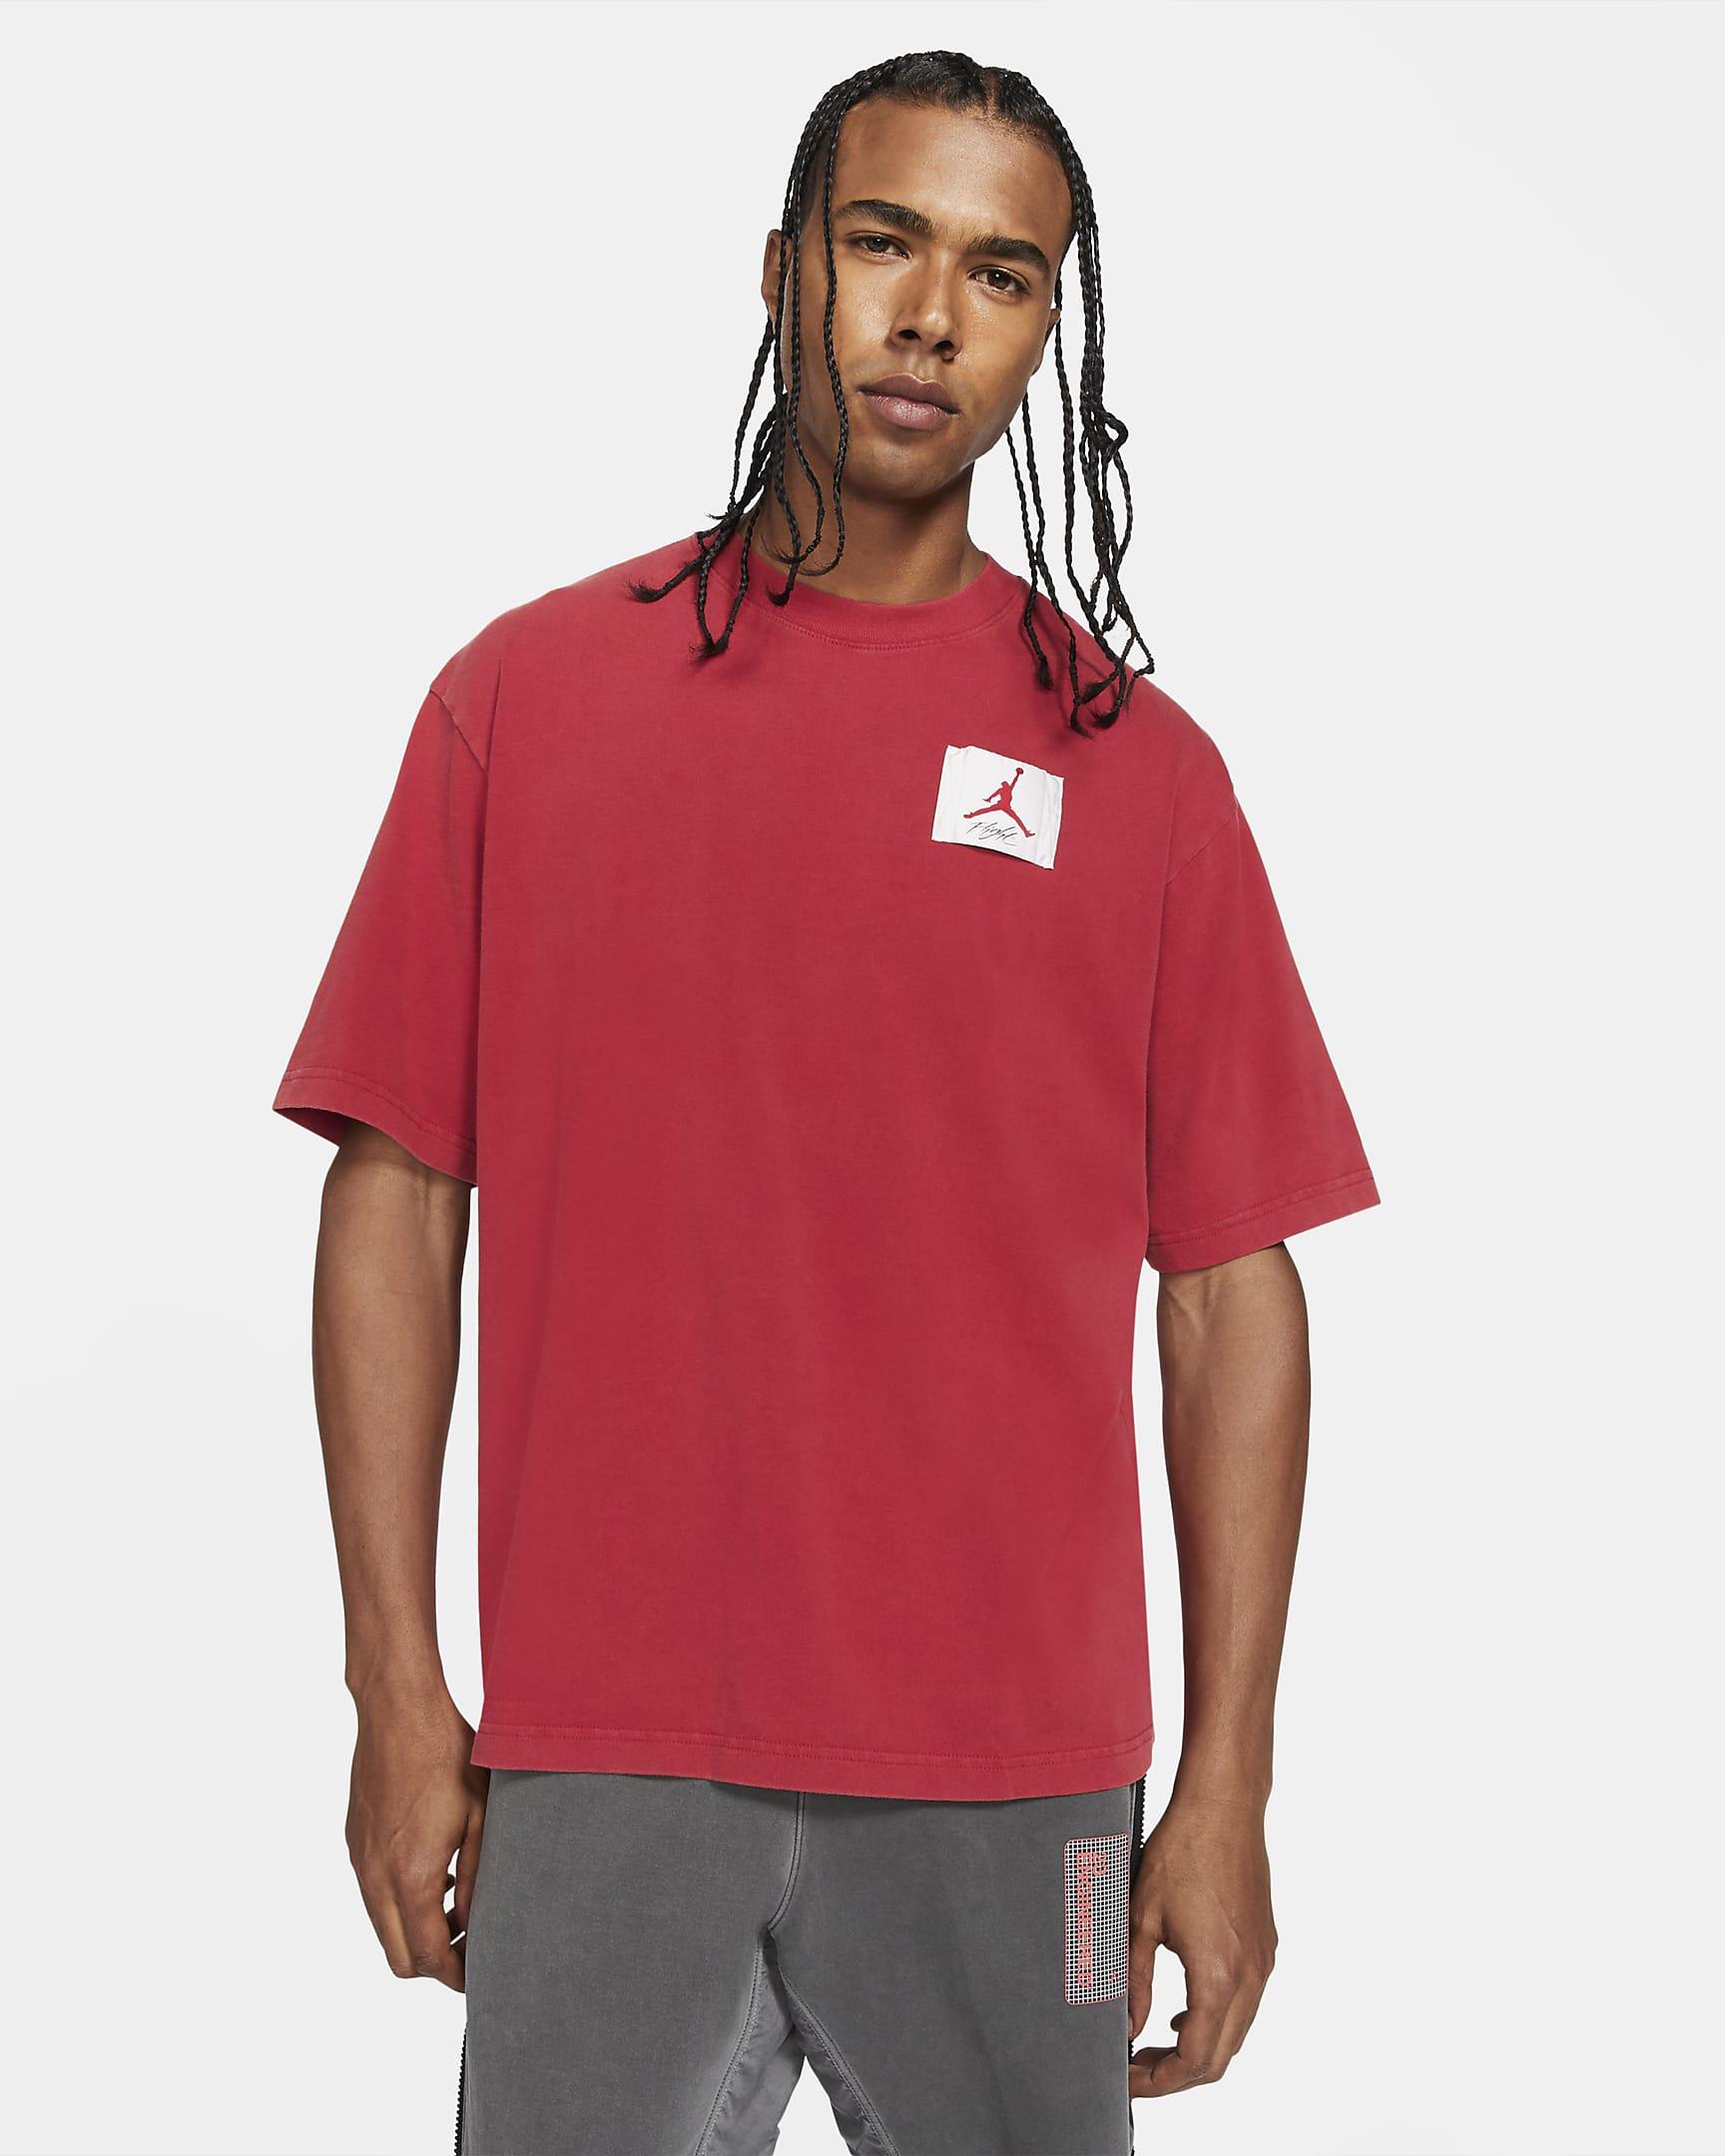 jordan-flight-mens-short-sleeve-t-shirt-C564t8-2